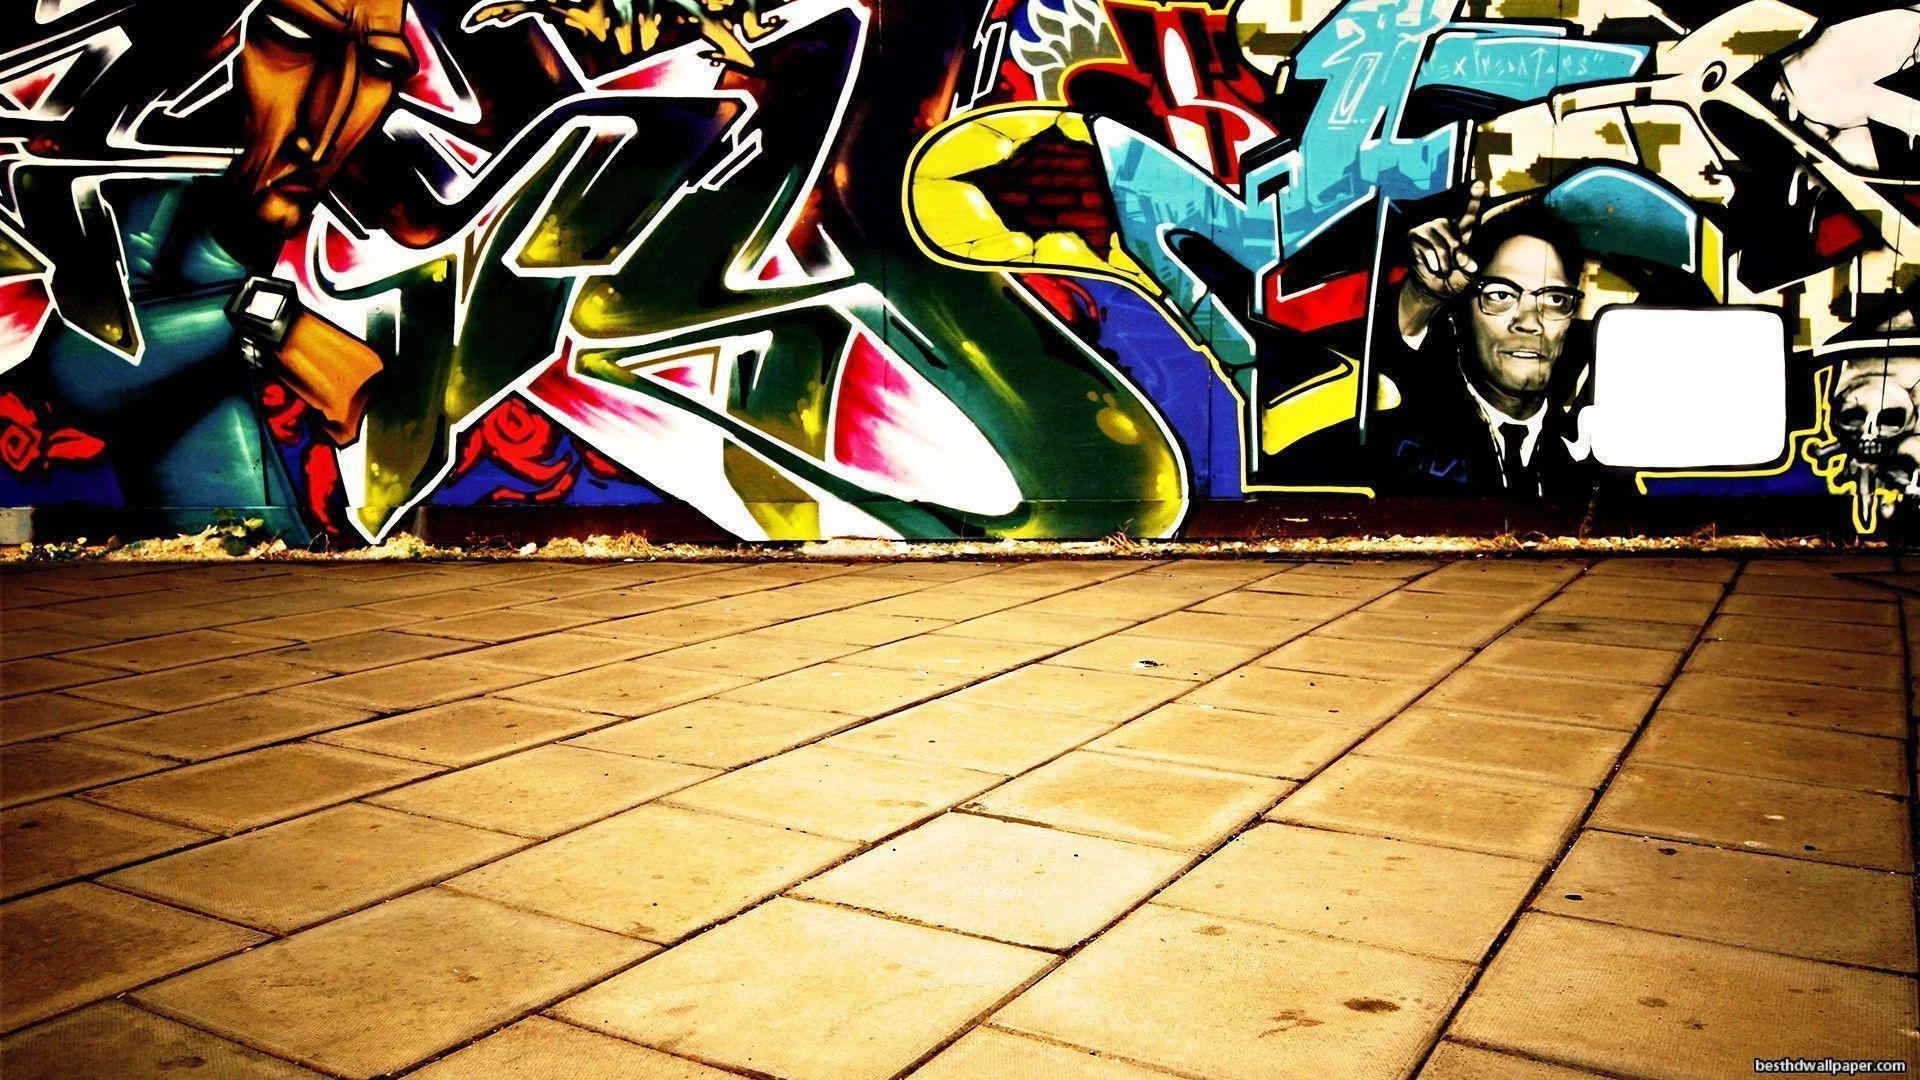 HD Graffiti Wallpapers